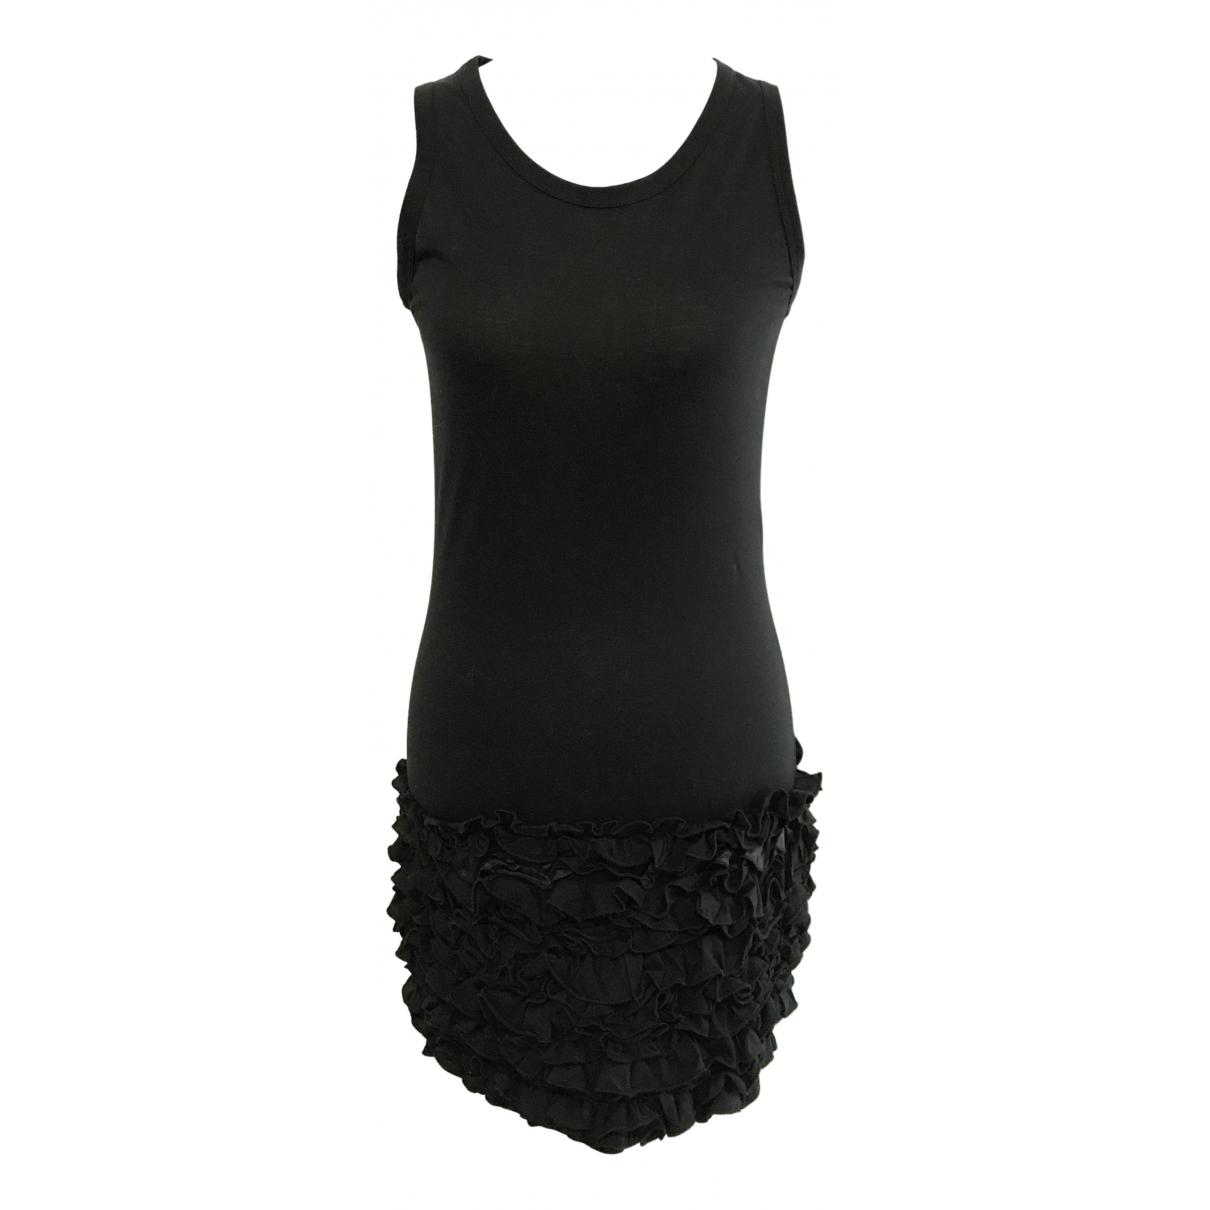 Stella Mccartney \N Black Cotton dress for Women 40 FR